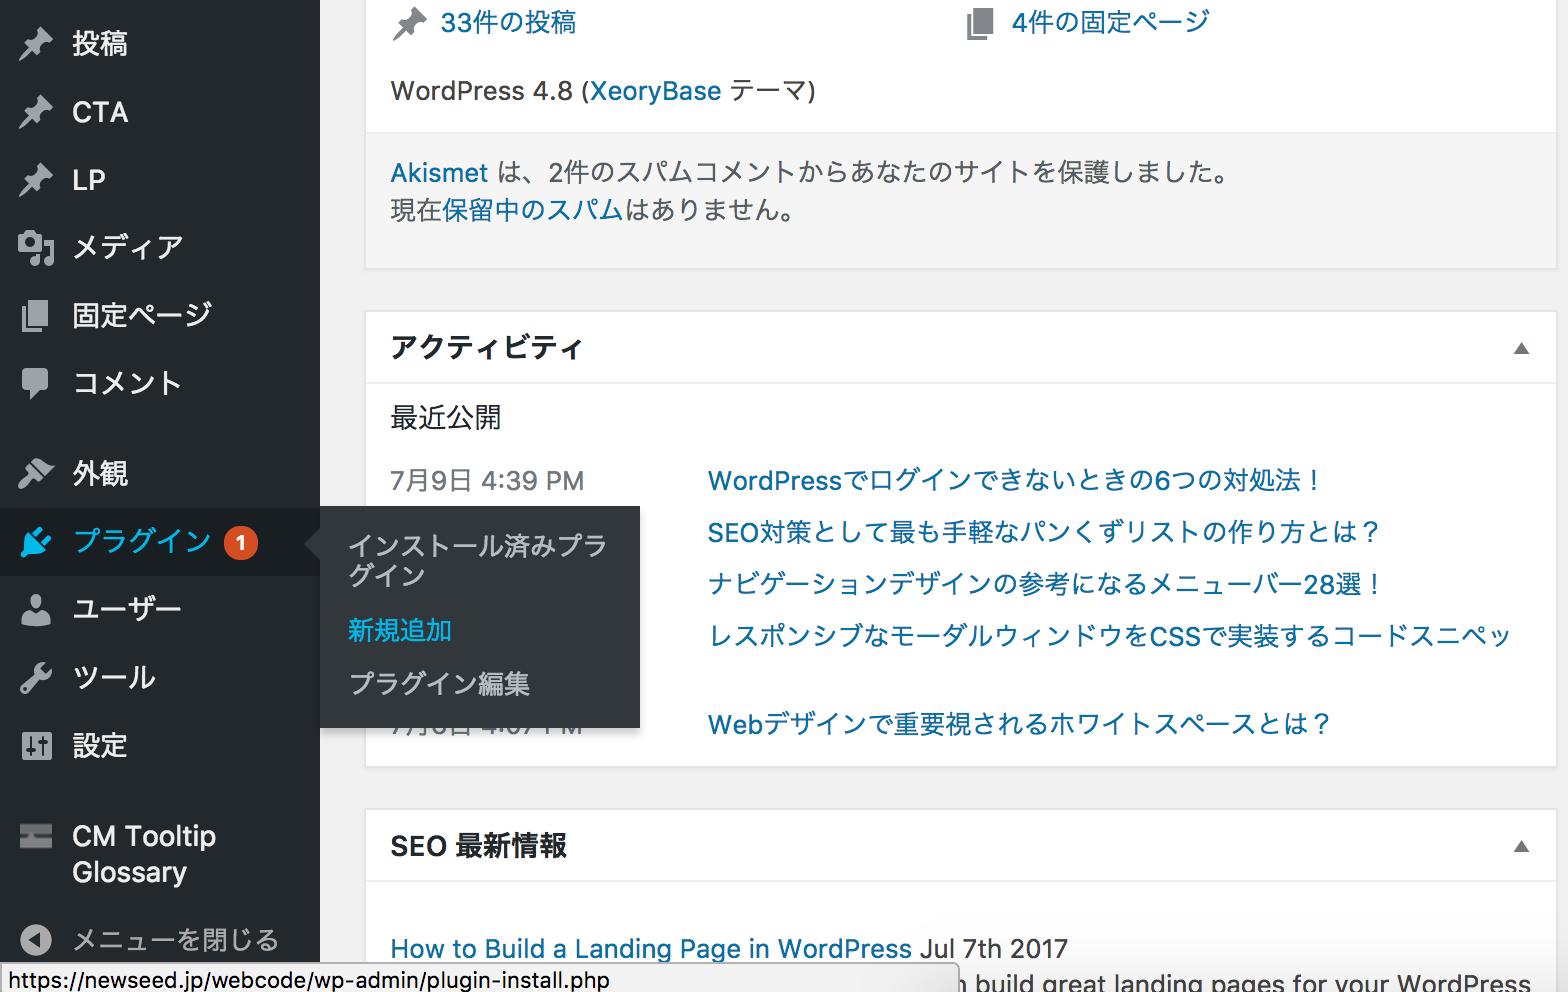 wordpress plugin 1 - WordPressのプラグインがインストール・新規追加できない時の対処法